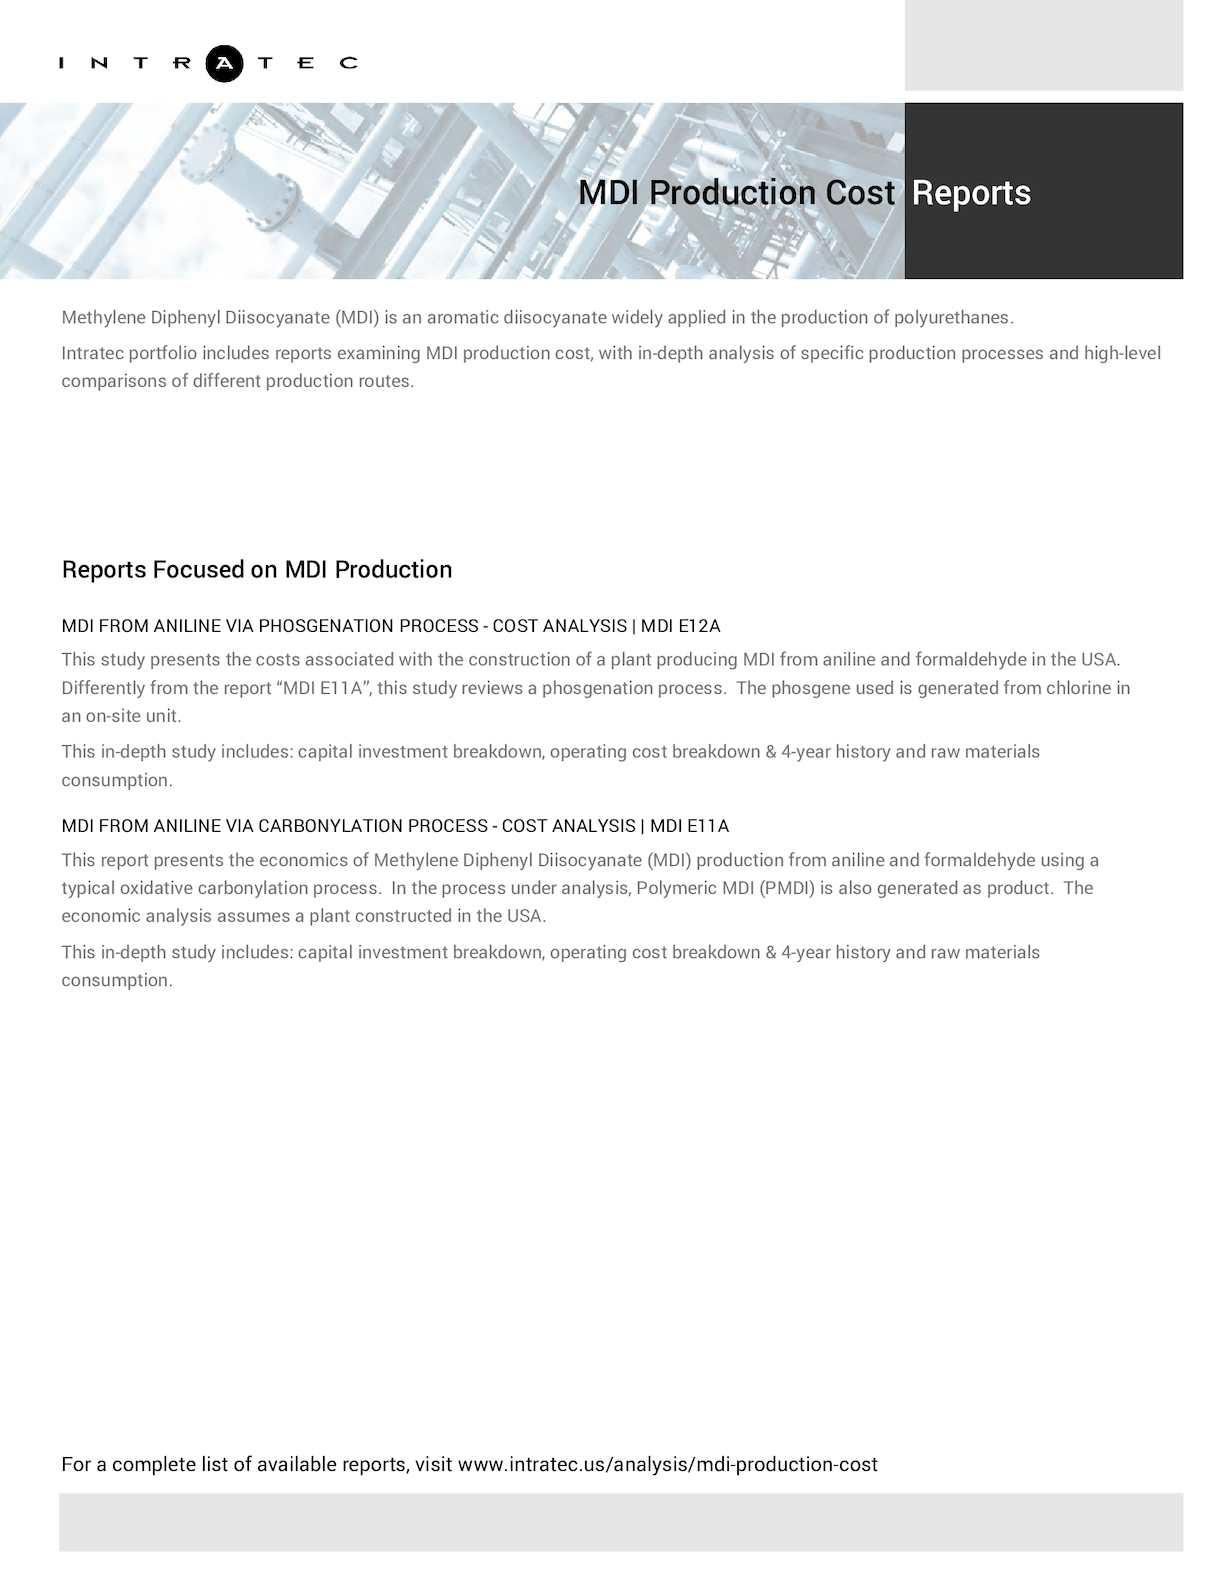 Calaméo - Techno-Economic Assessment about MDI